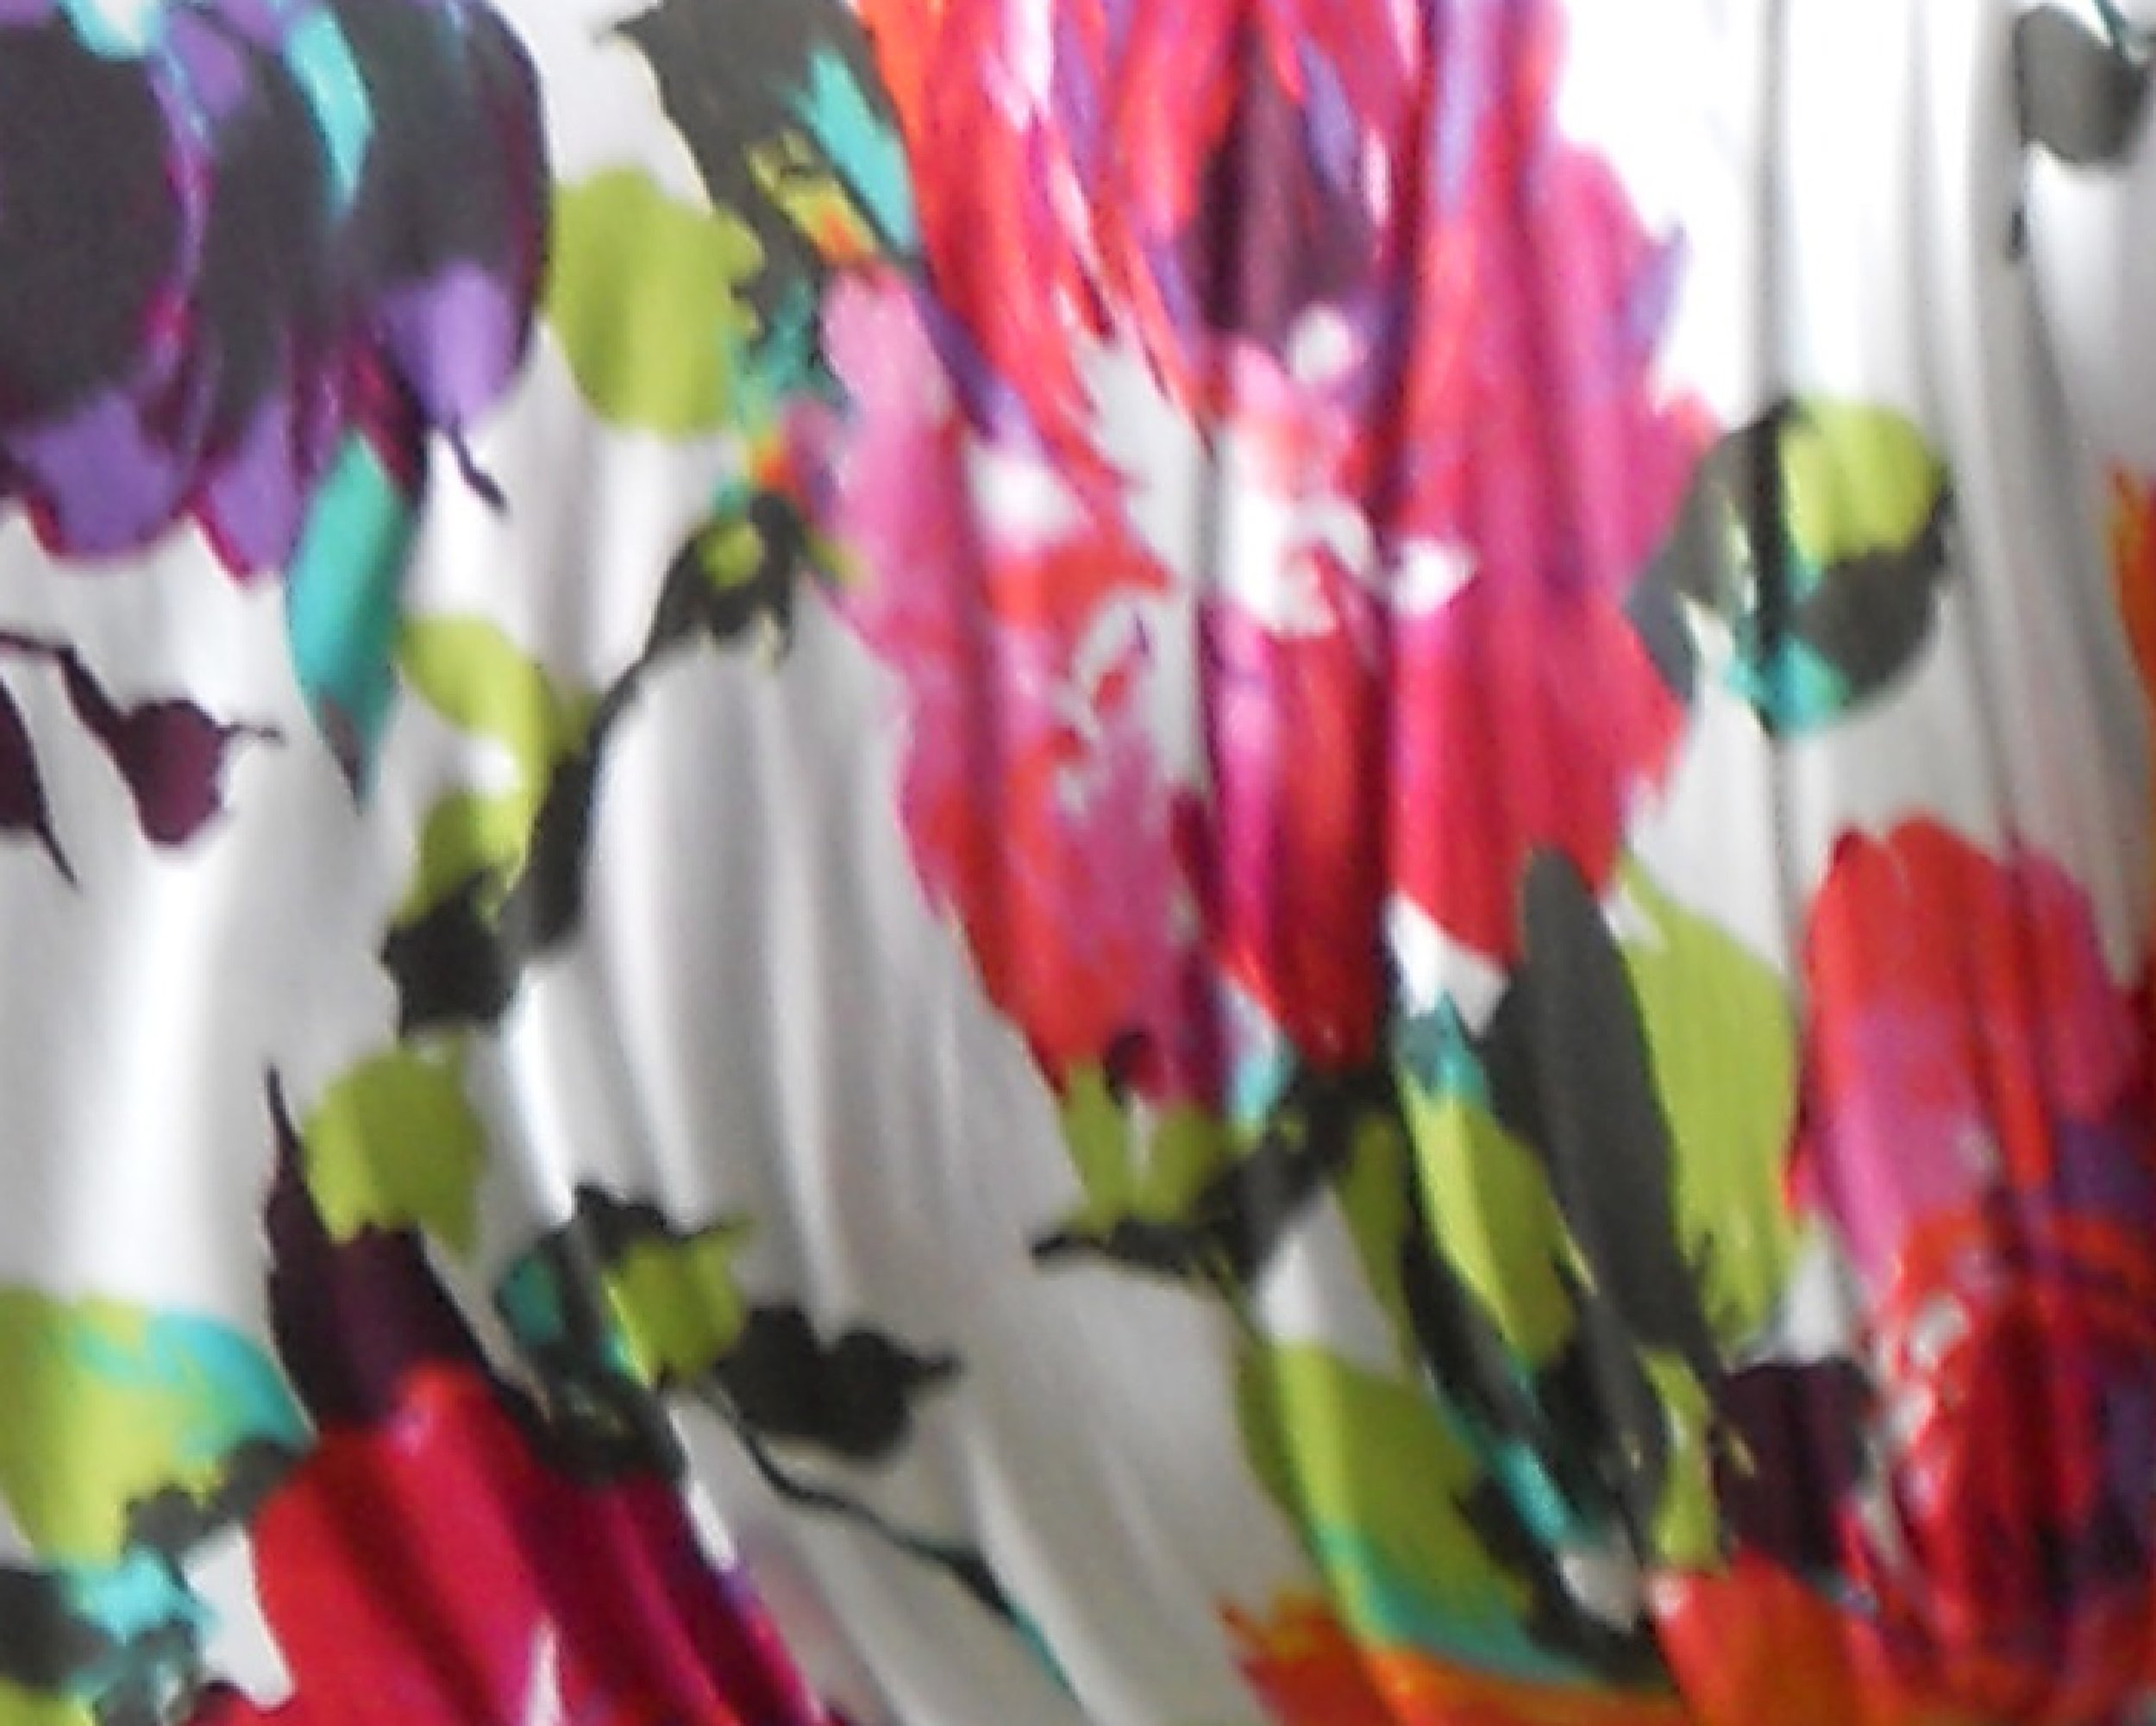 DSCN0127_textile_16x20.jpg